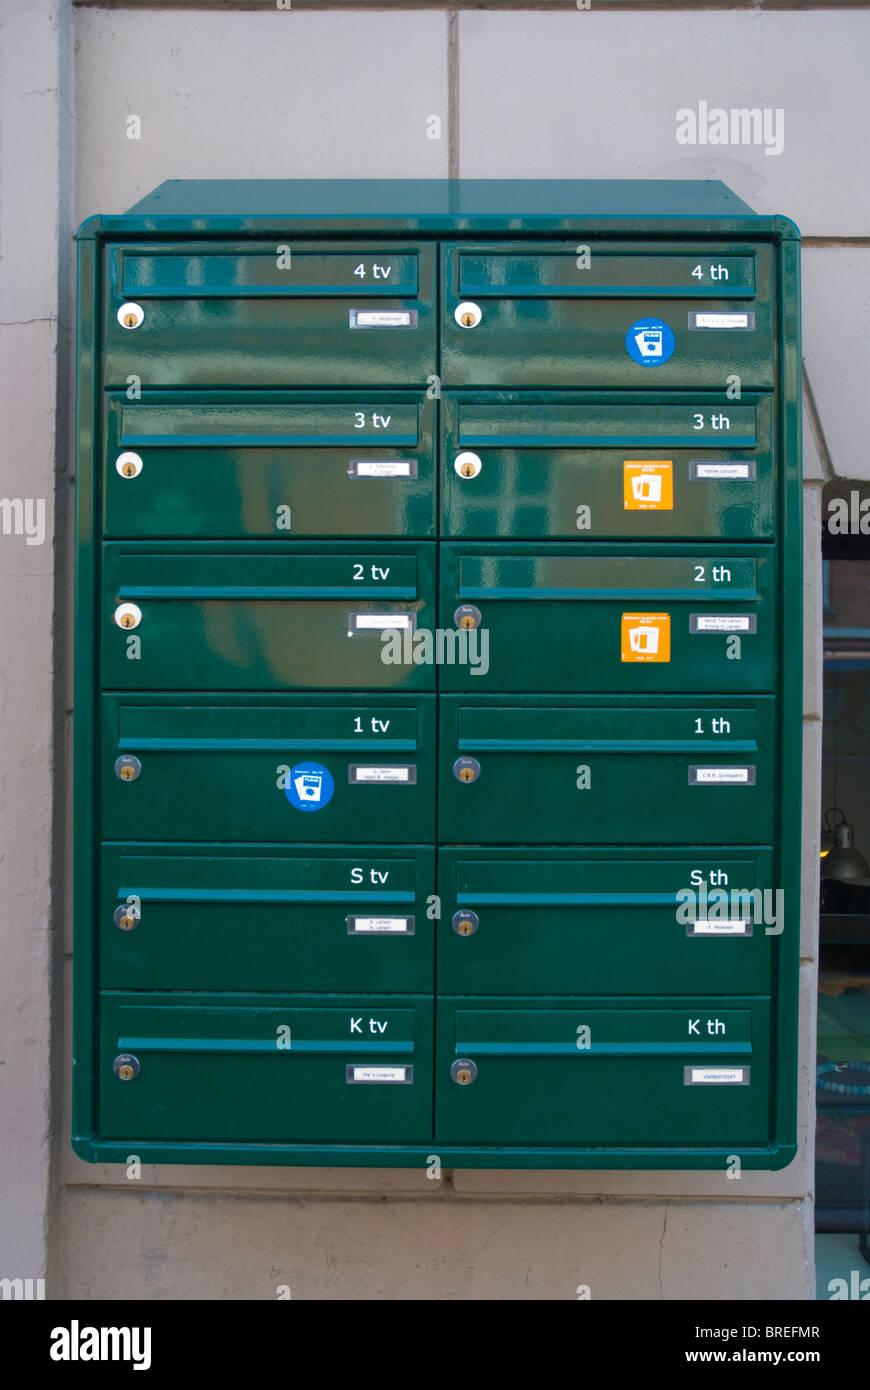 Postboxes outside a residential building Norrebro district central Copenhagen Denmark Europe - Stock Image